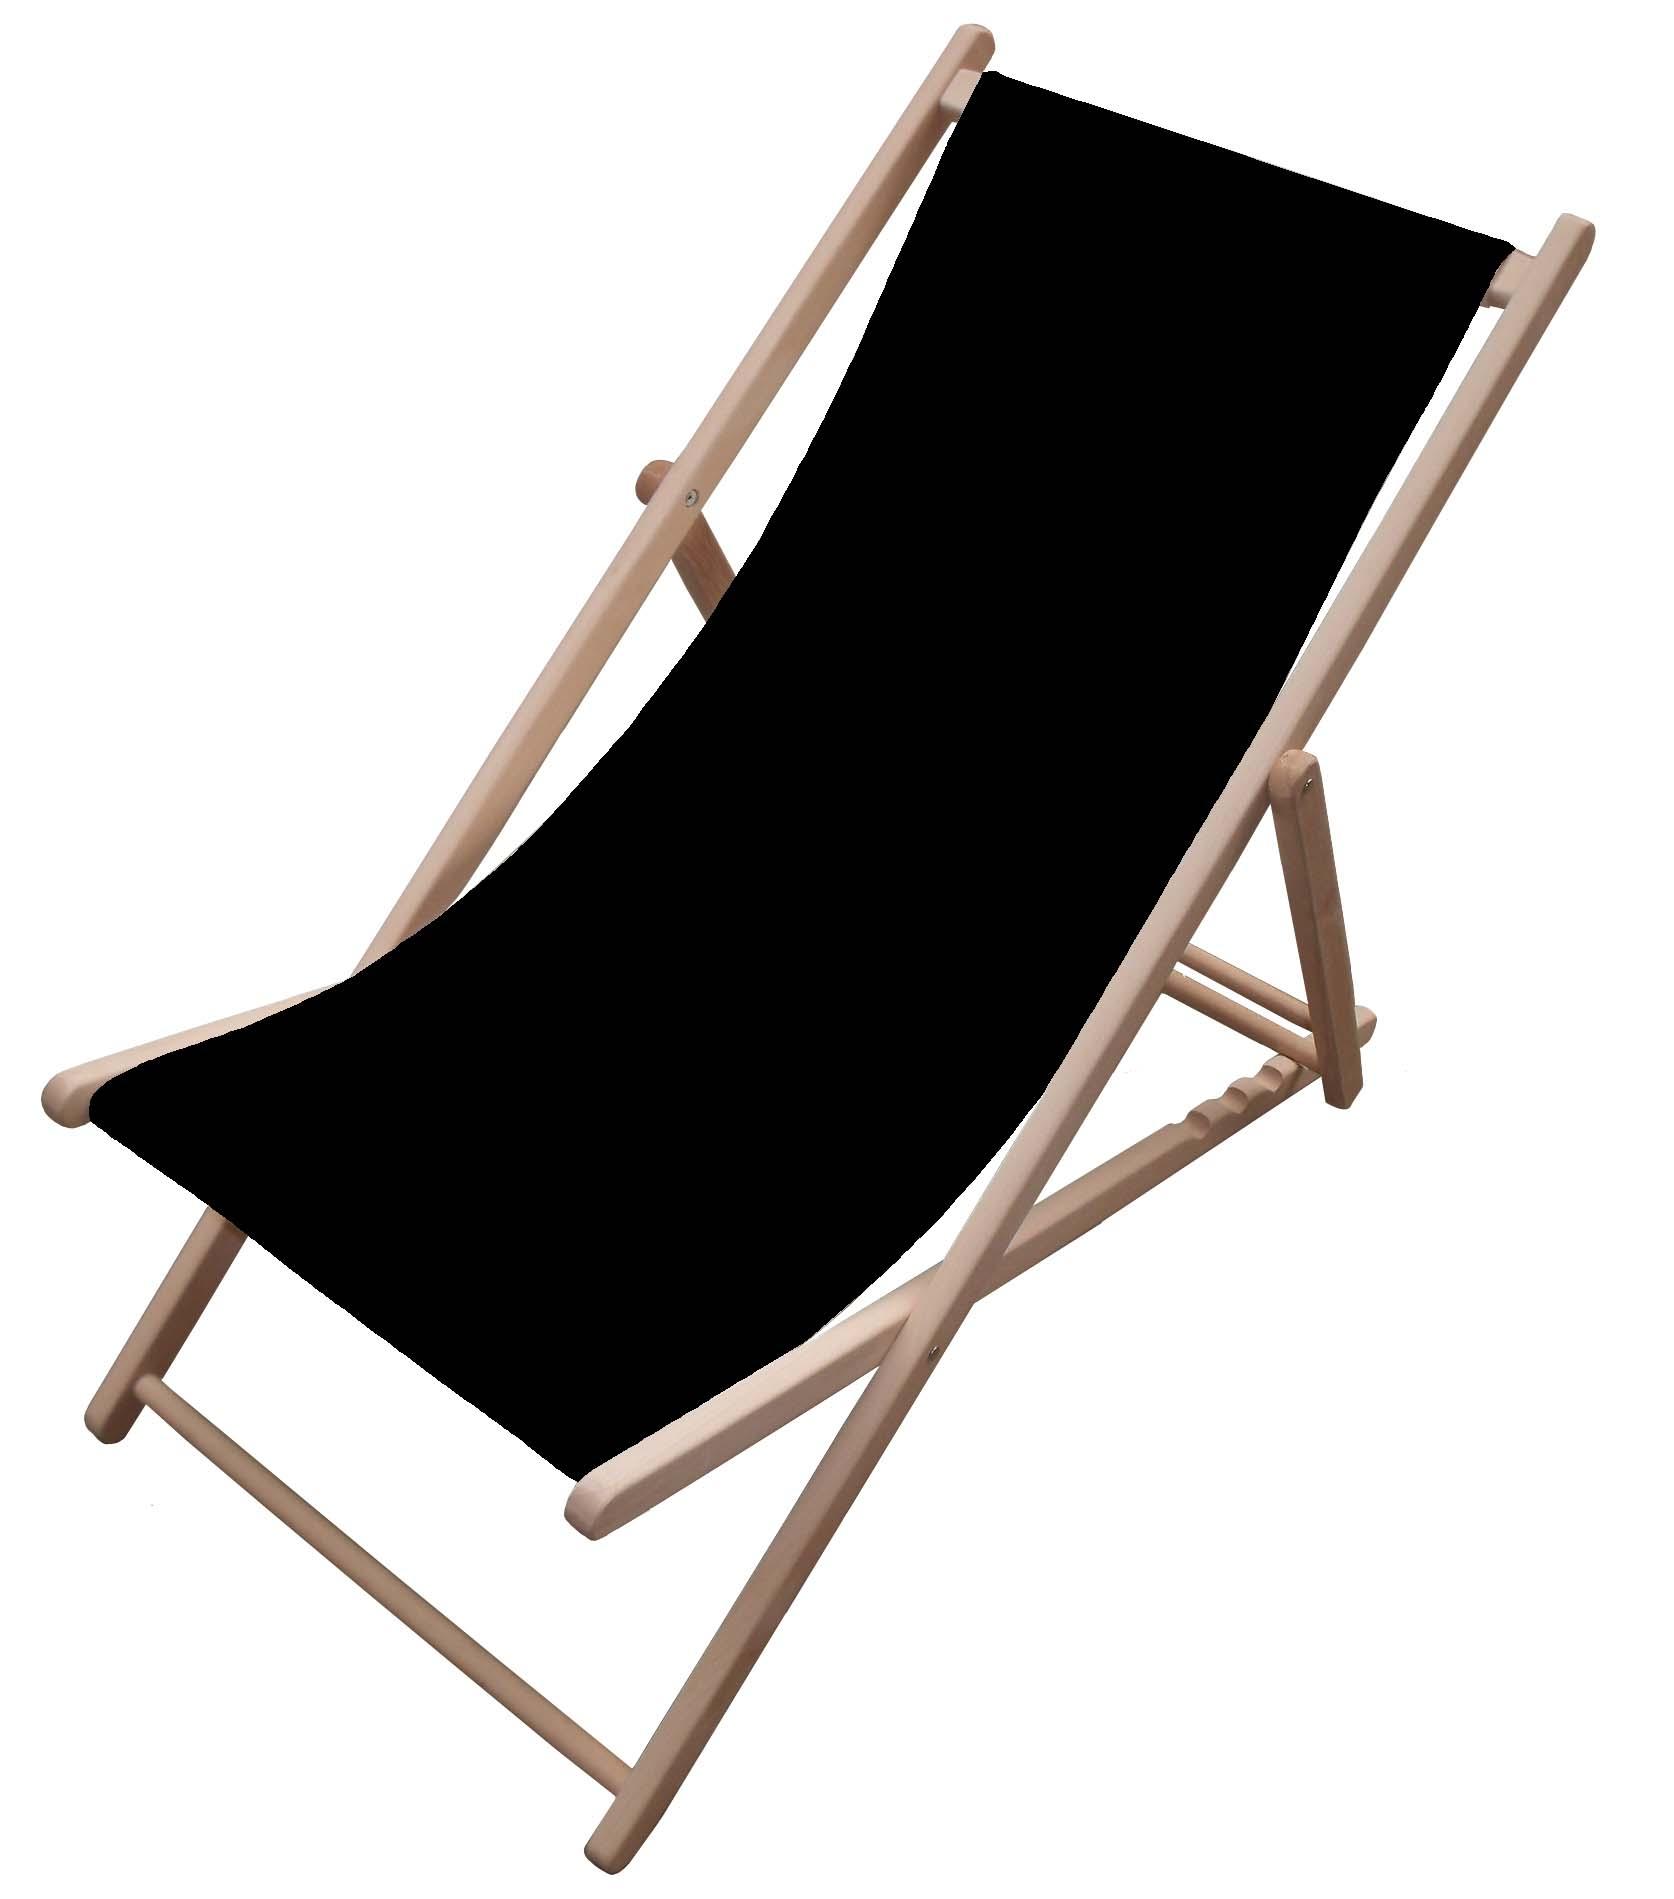 Black Garden Deck Chair Canvas Fsc Buy Outdoor Furniture Fsc